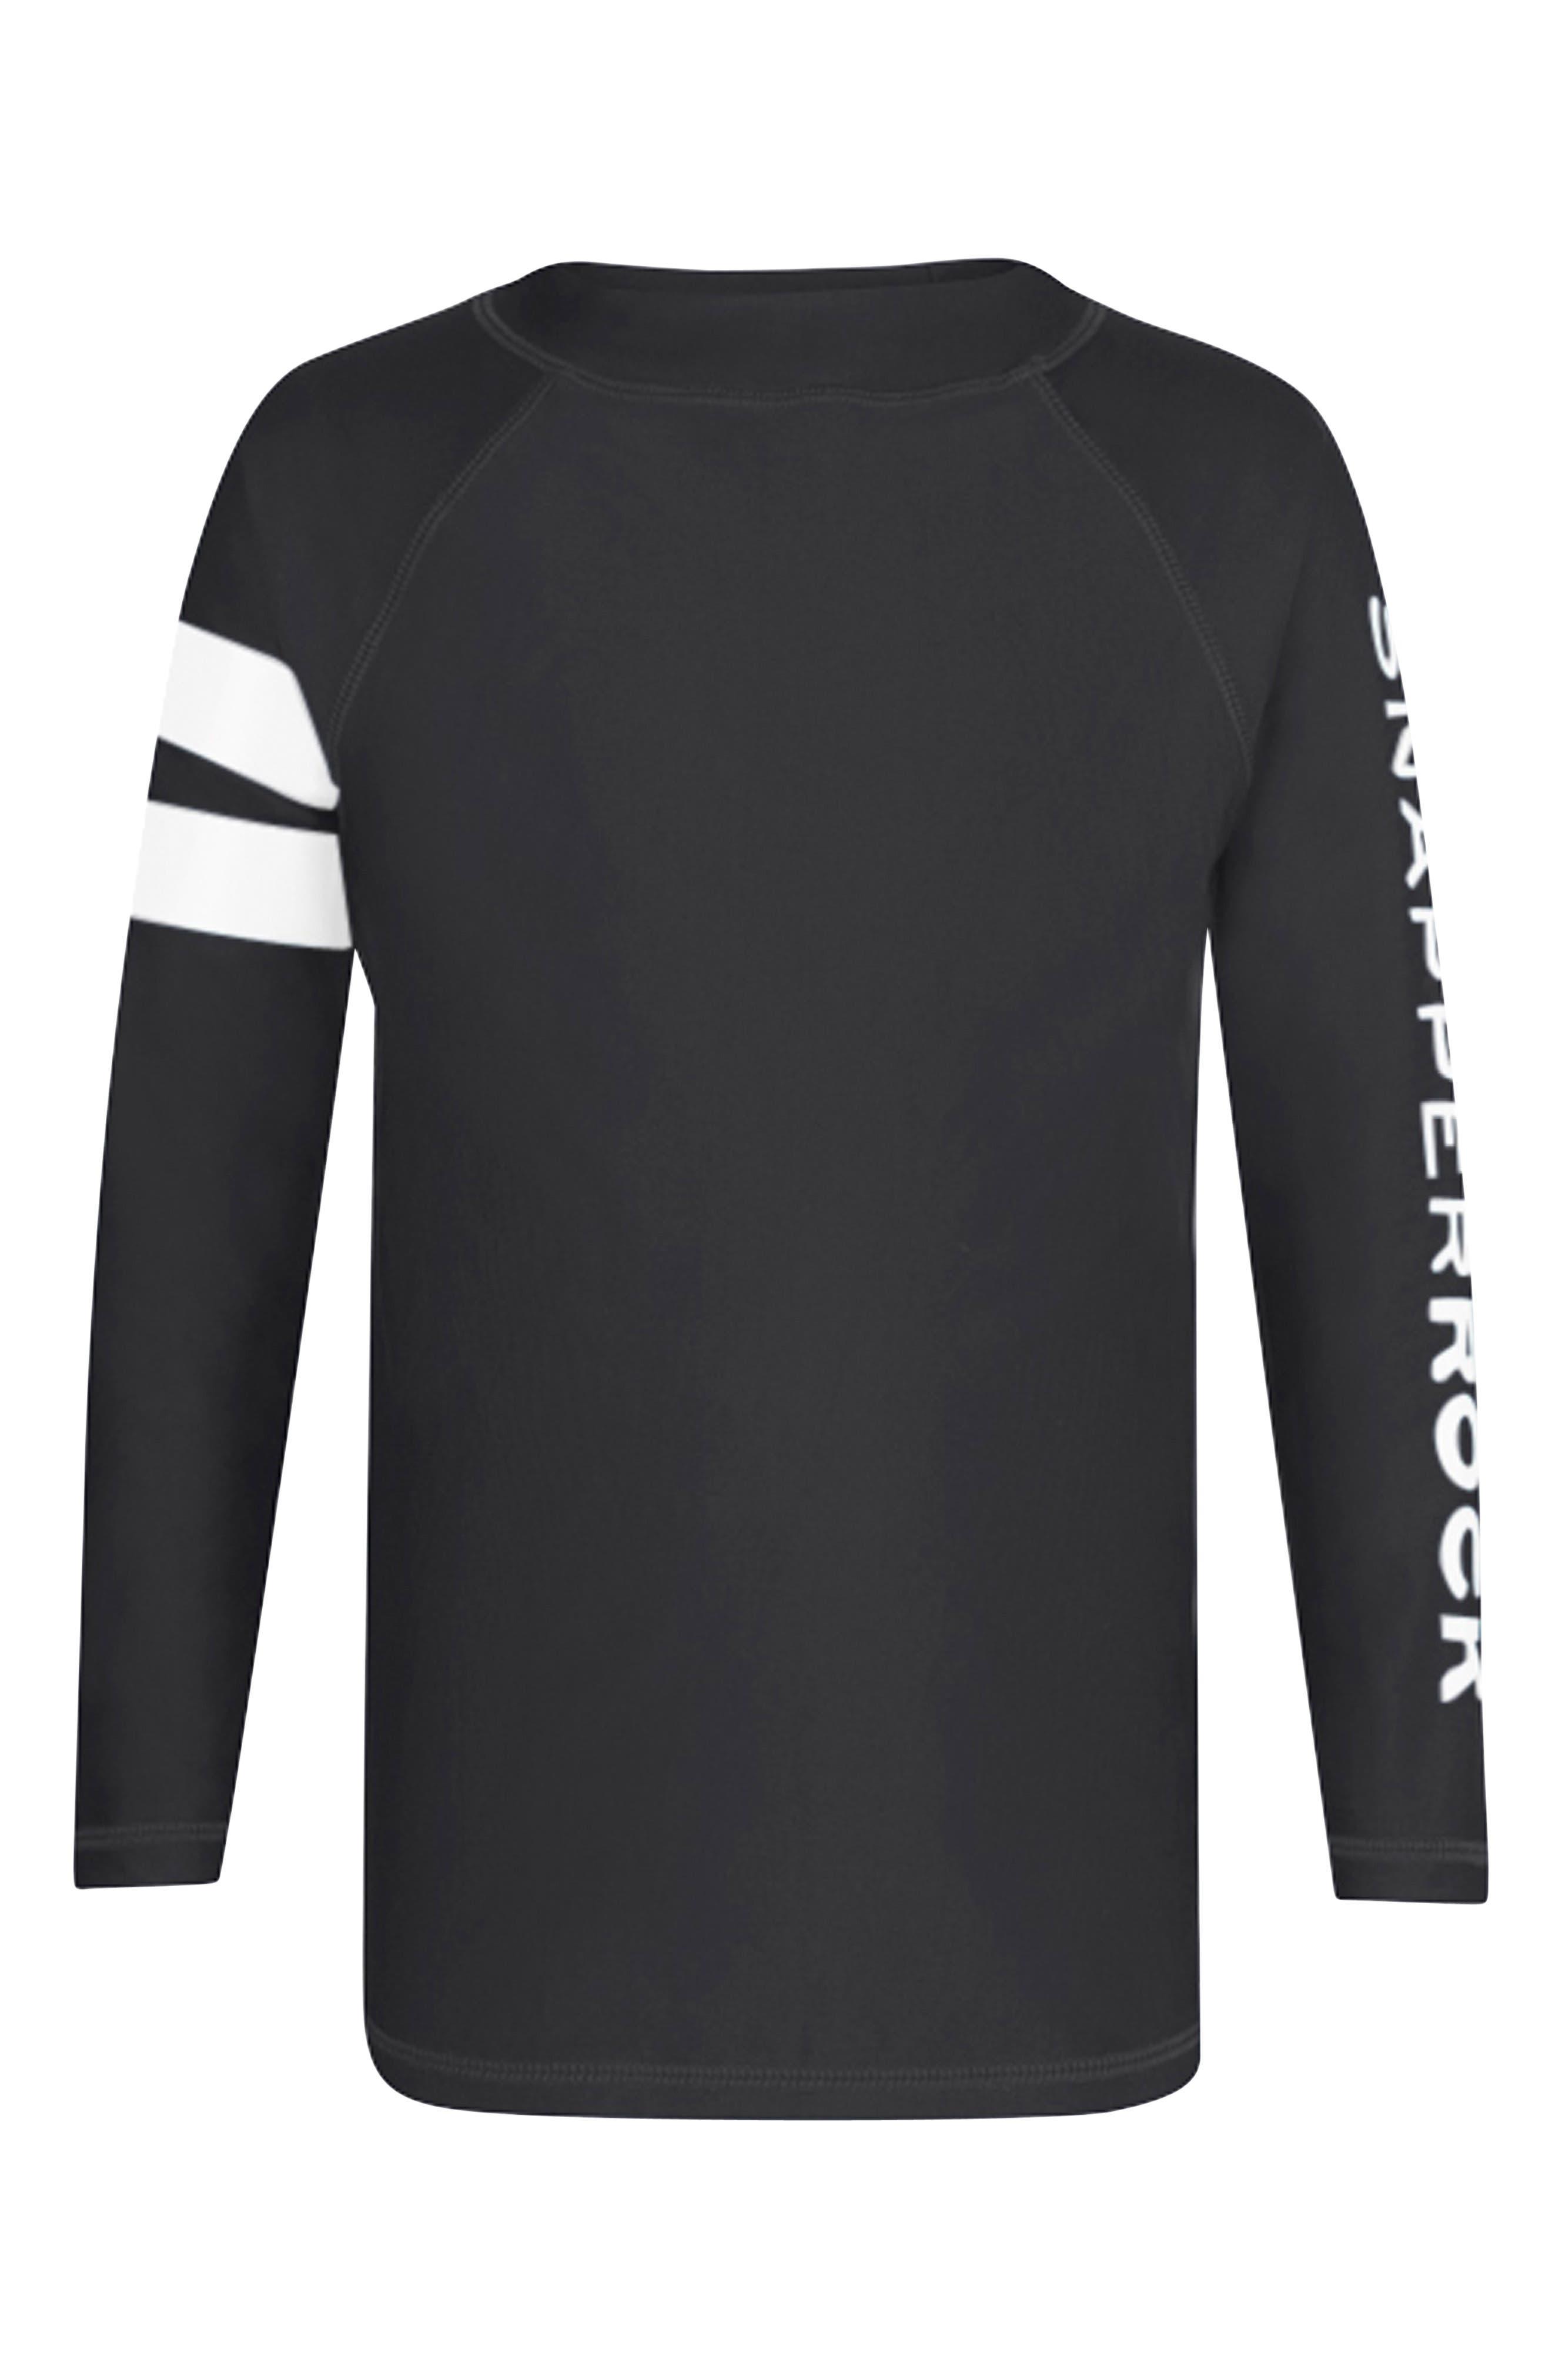 Long Sleeve Rashguard,                         Main,                         color, STEEL GREY